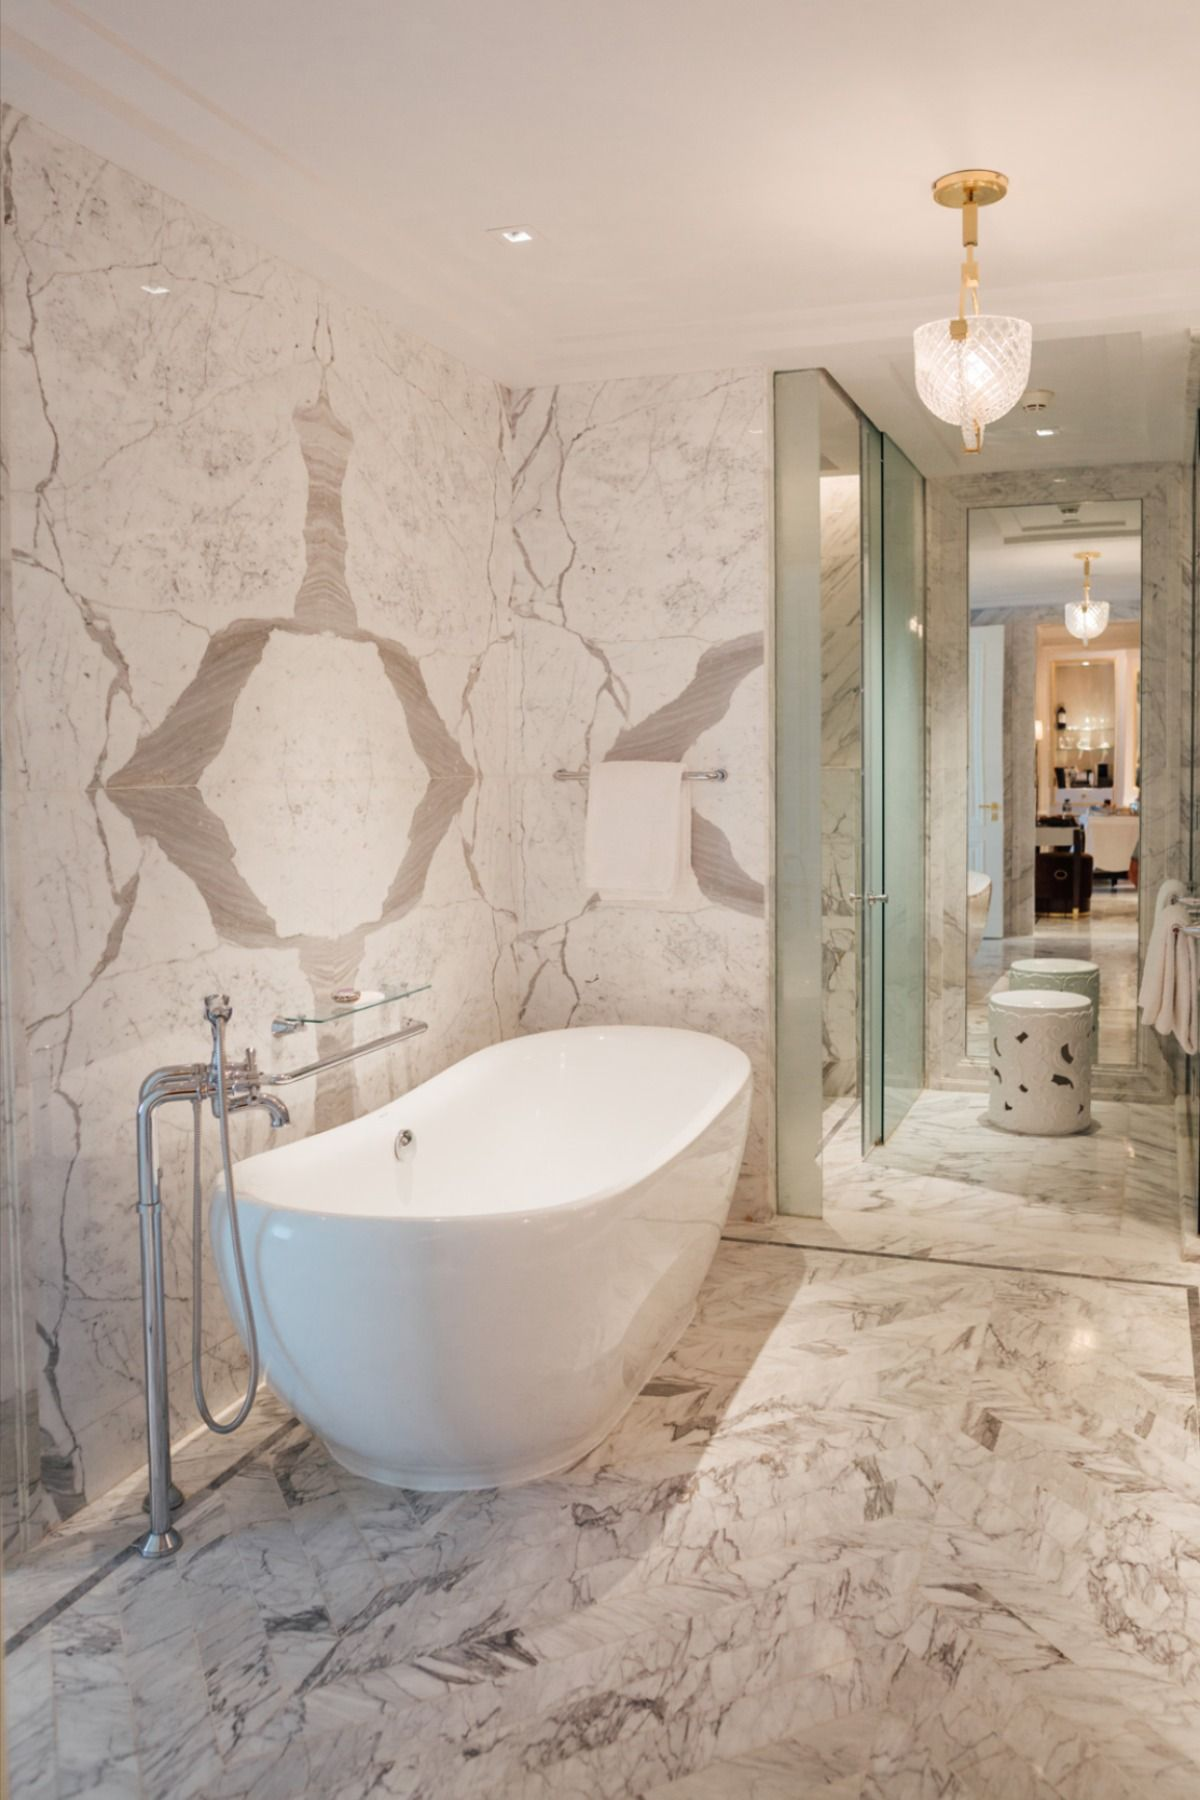 Maison Valentina Luxury Bathrooms In 2020 Luxury Bathroom Marble Bathroom Designs Bathroom Design